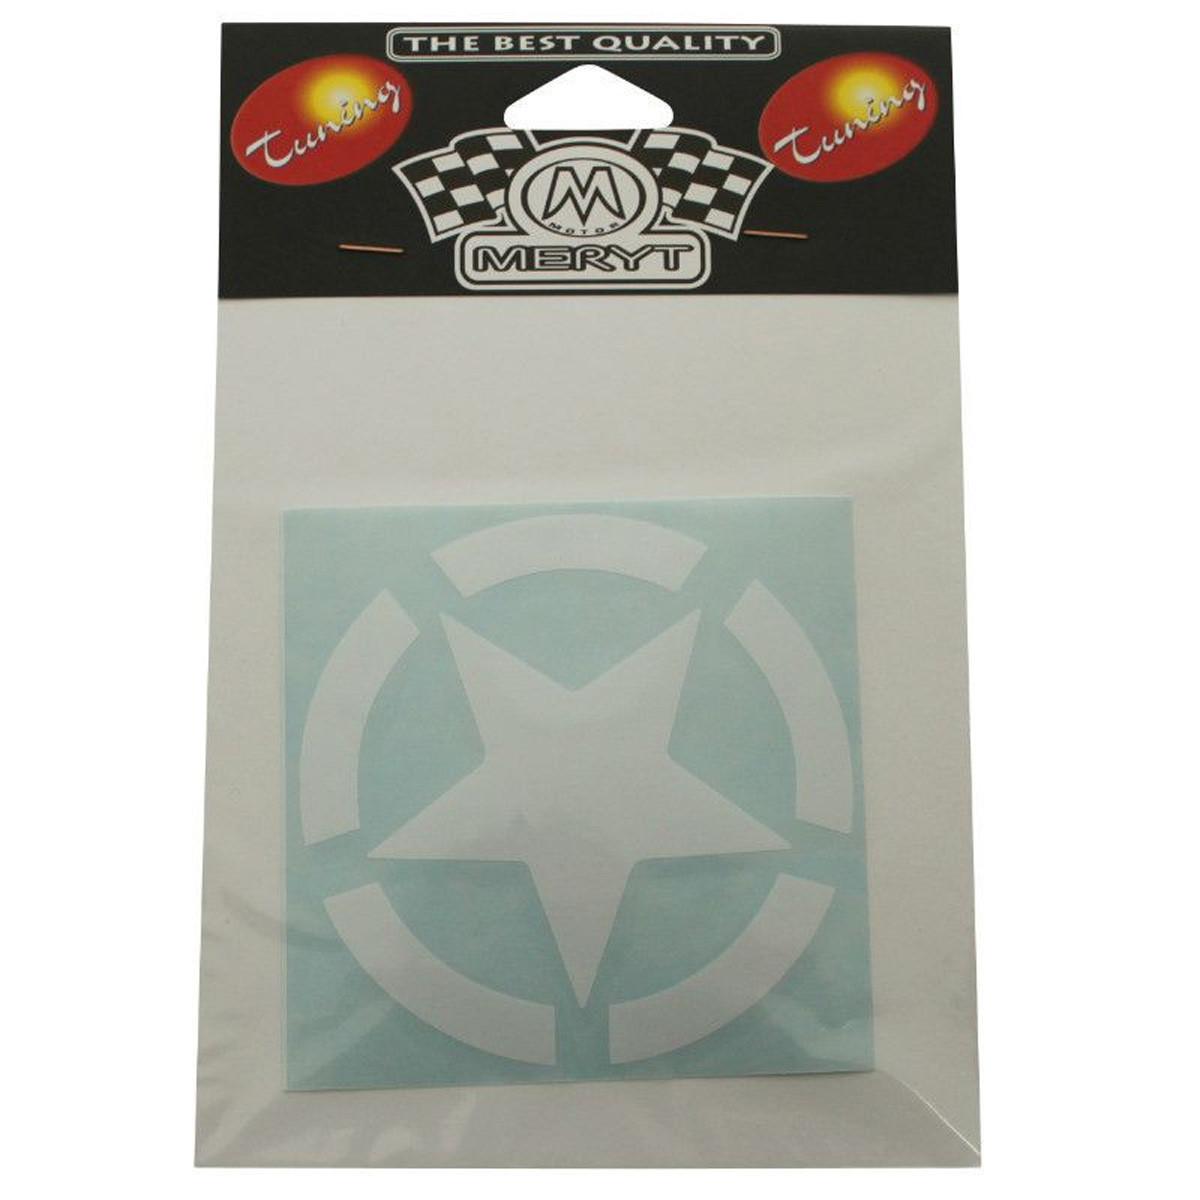 Autocollant / Sticker - MERYT Etoile Blanc 10 x 10cm